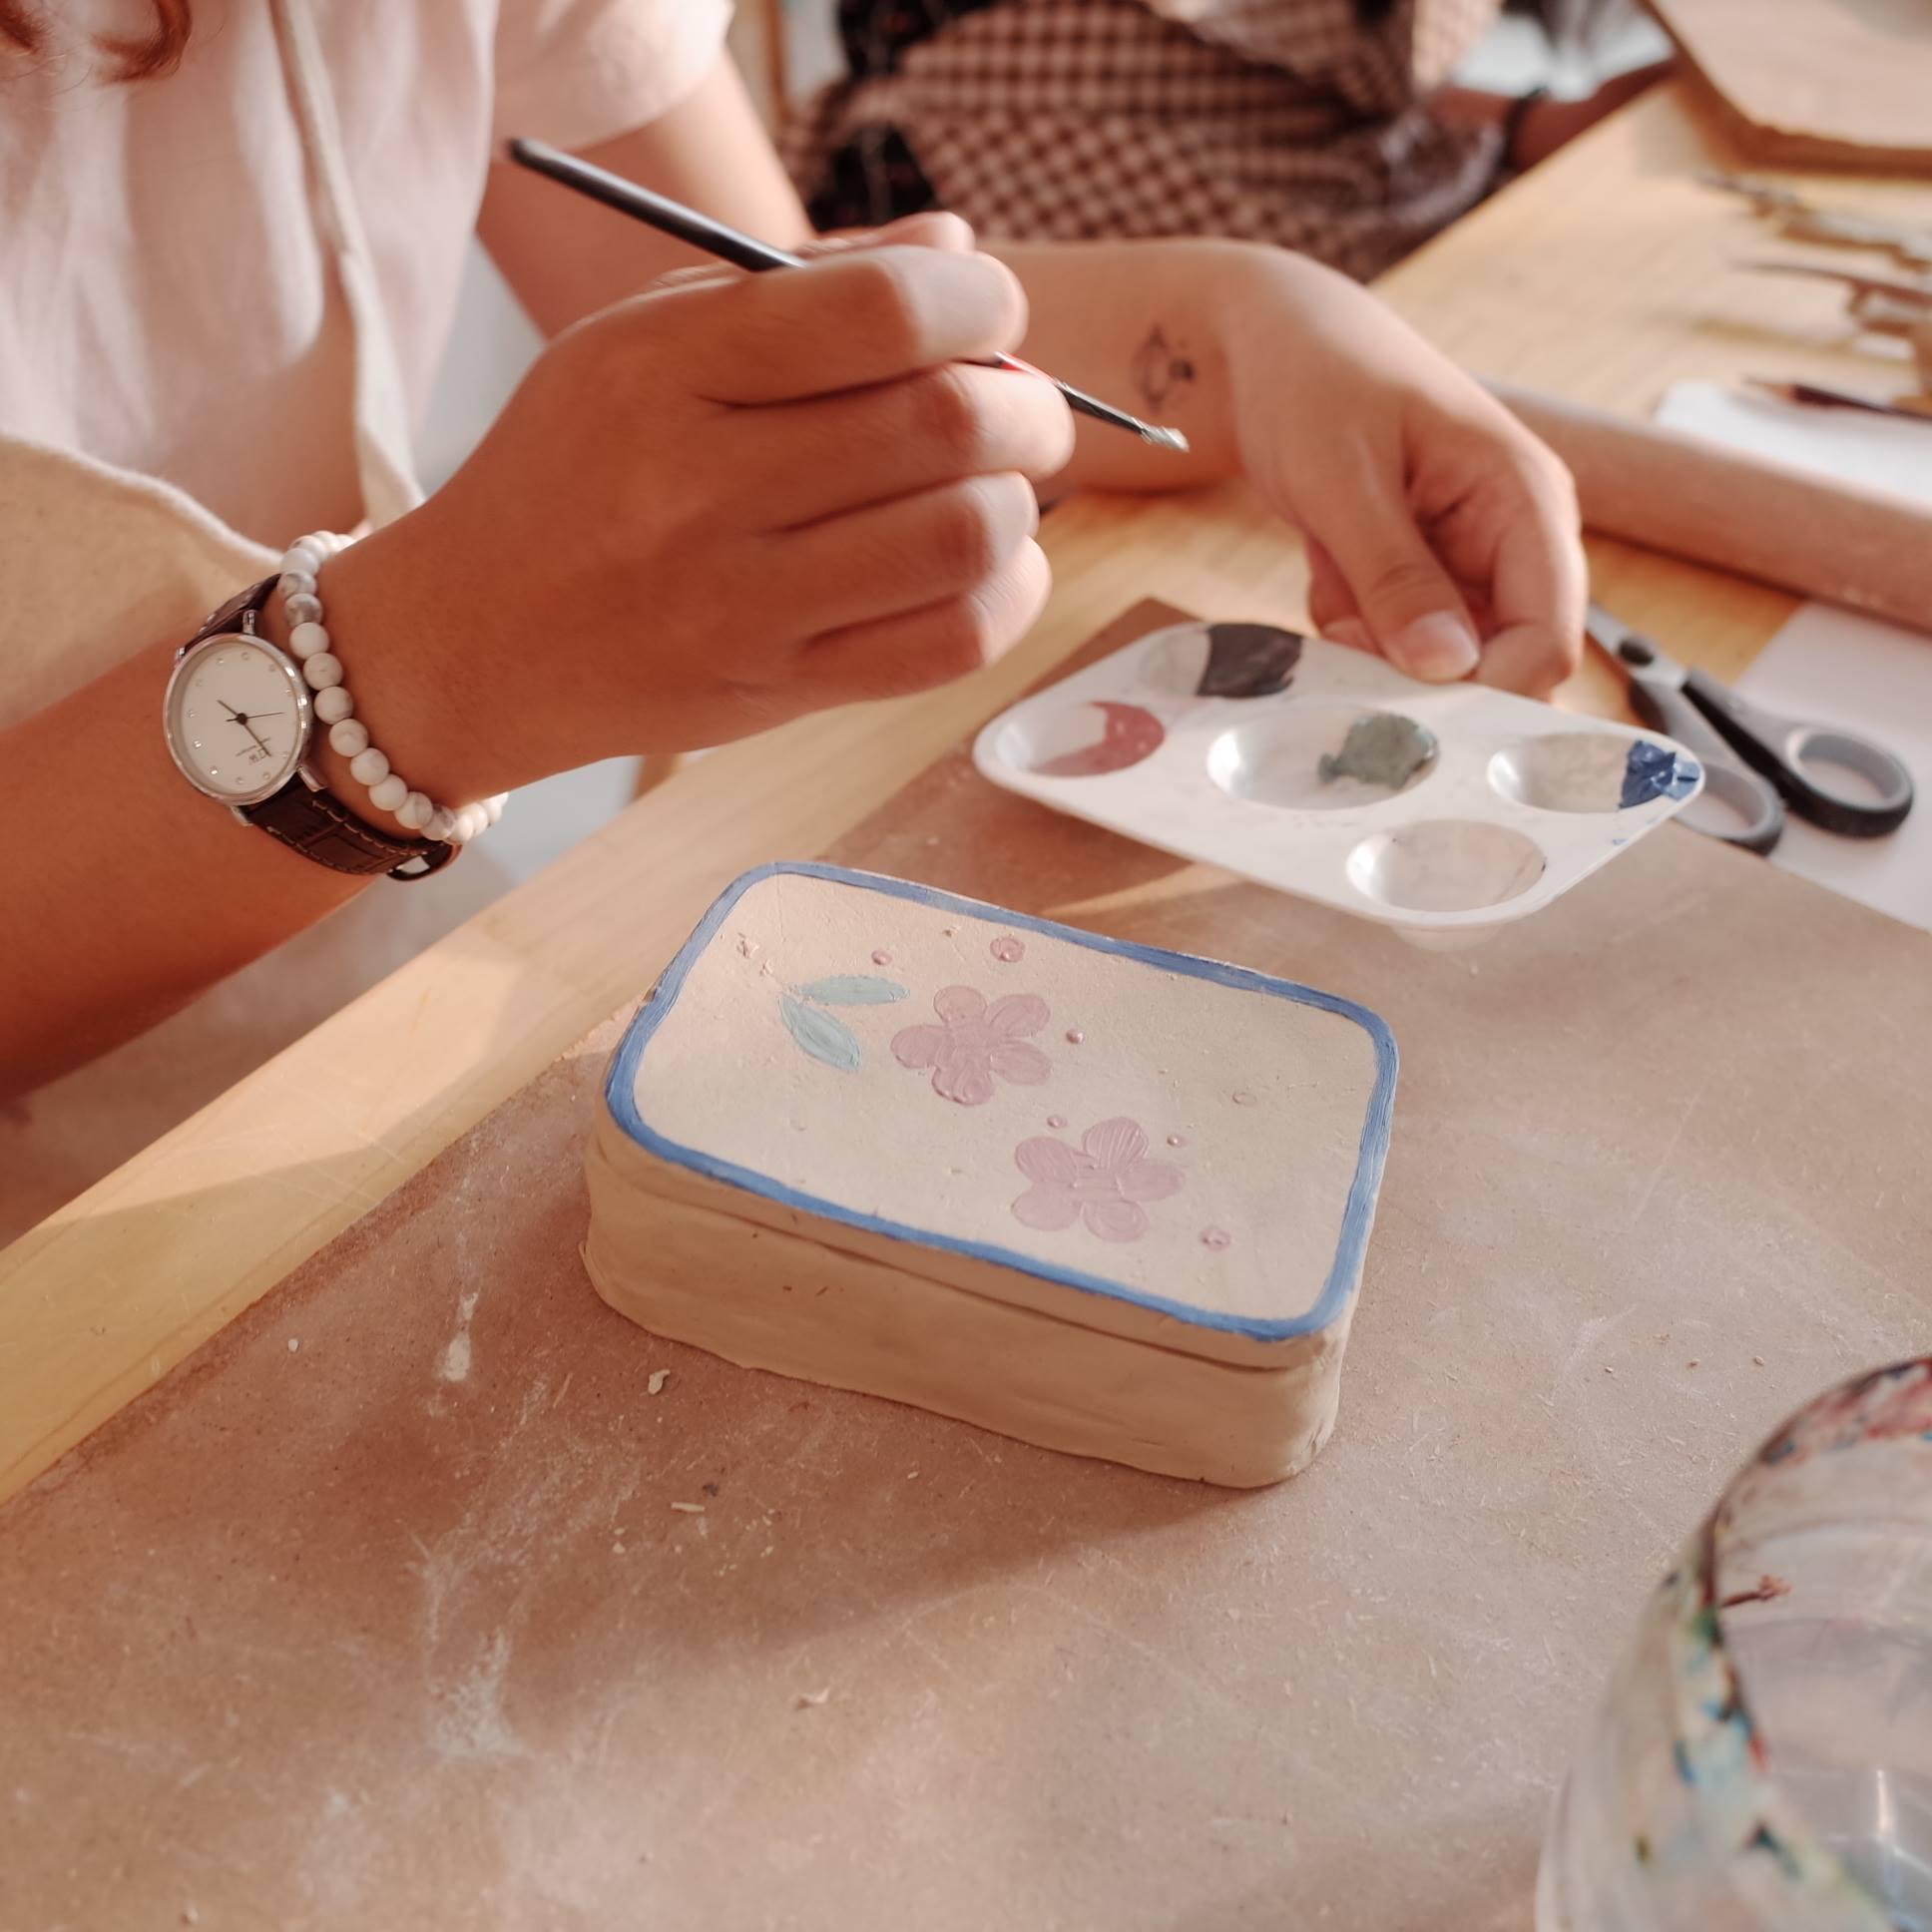 Lớp học làm gốm Sài Gòn-Haru Craft elledecoration vn 7